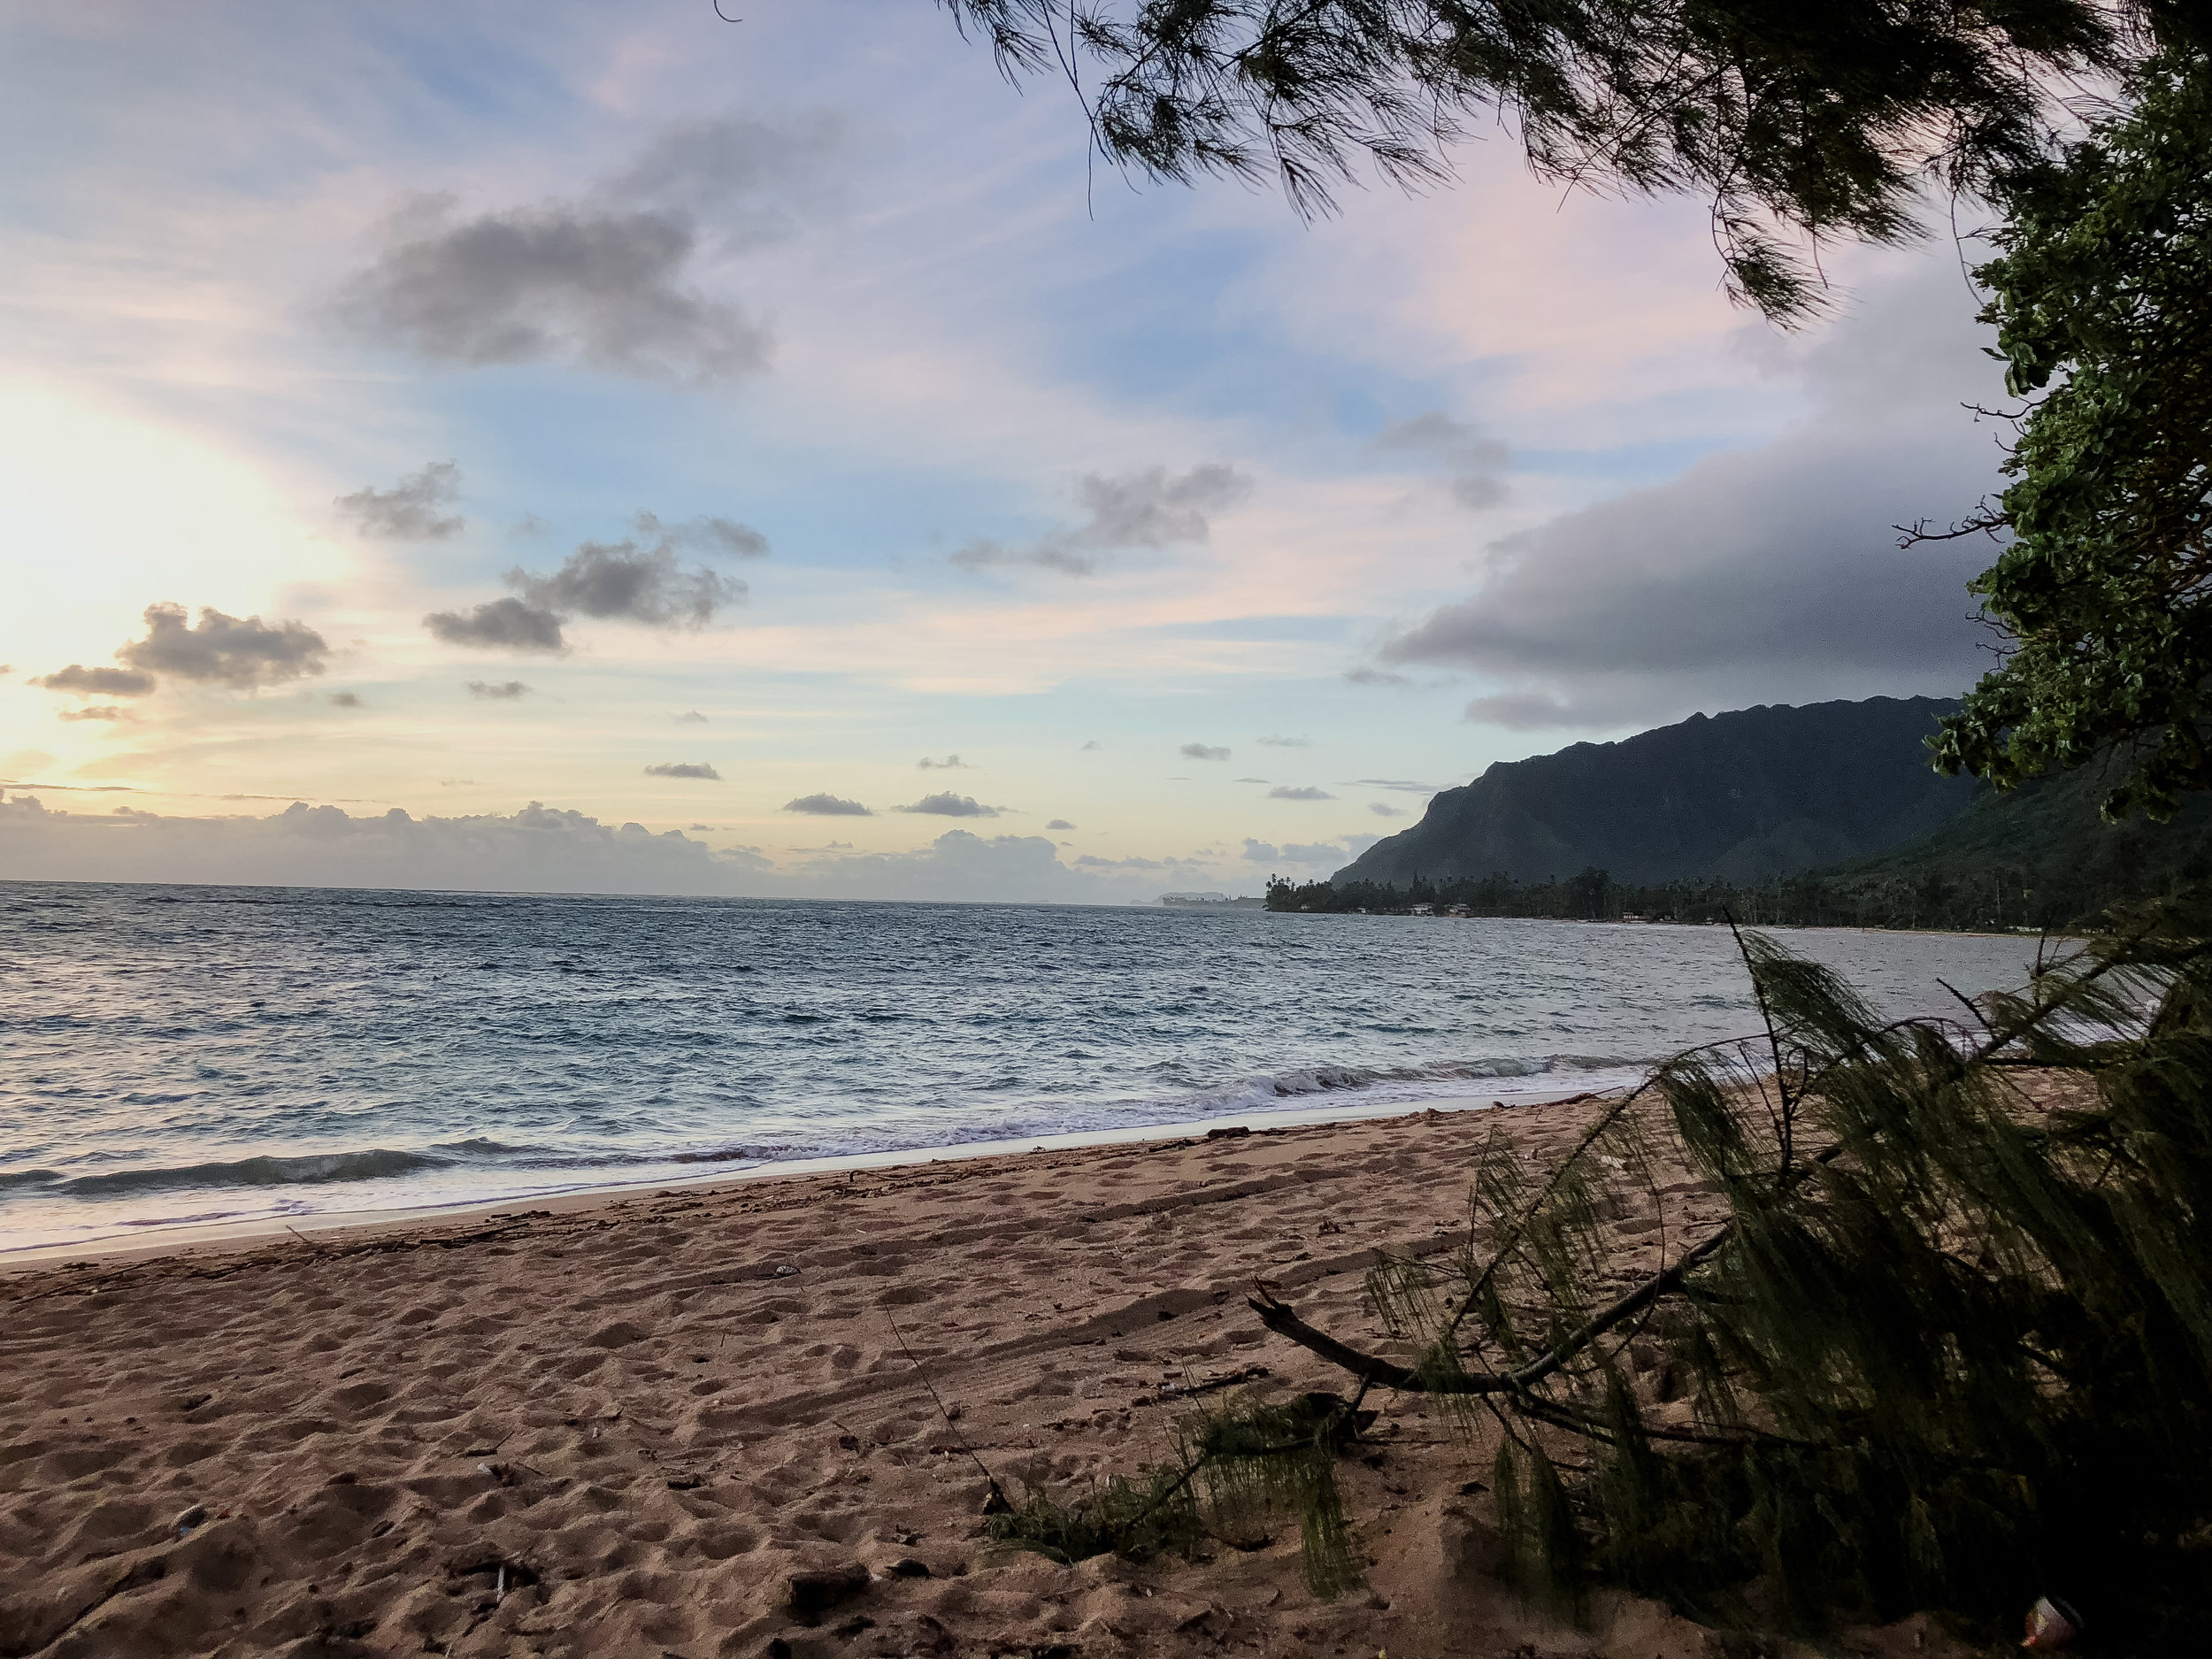 meagans hawaii pics-14.jpg